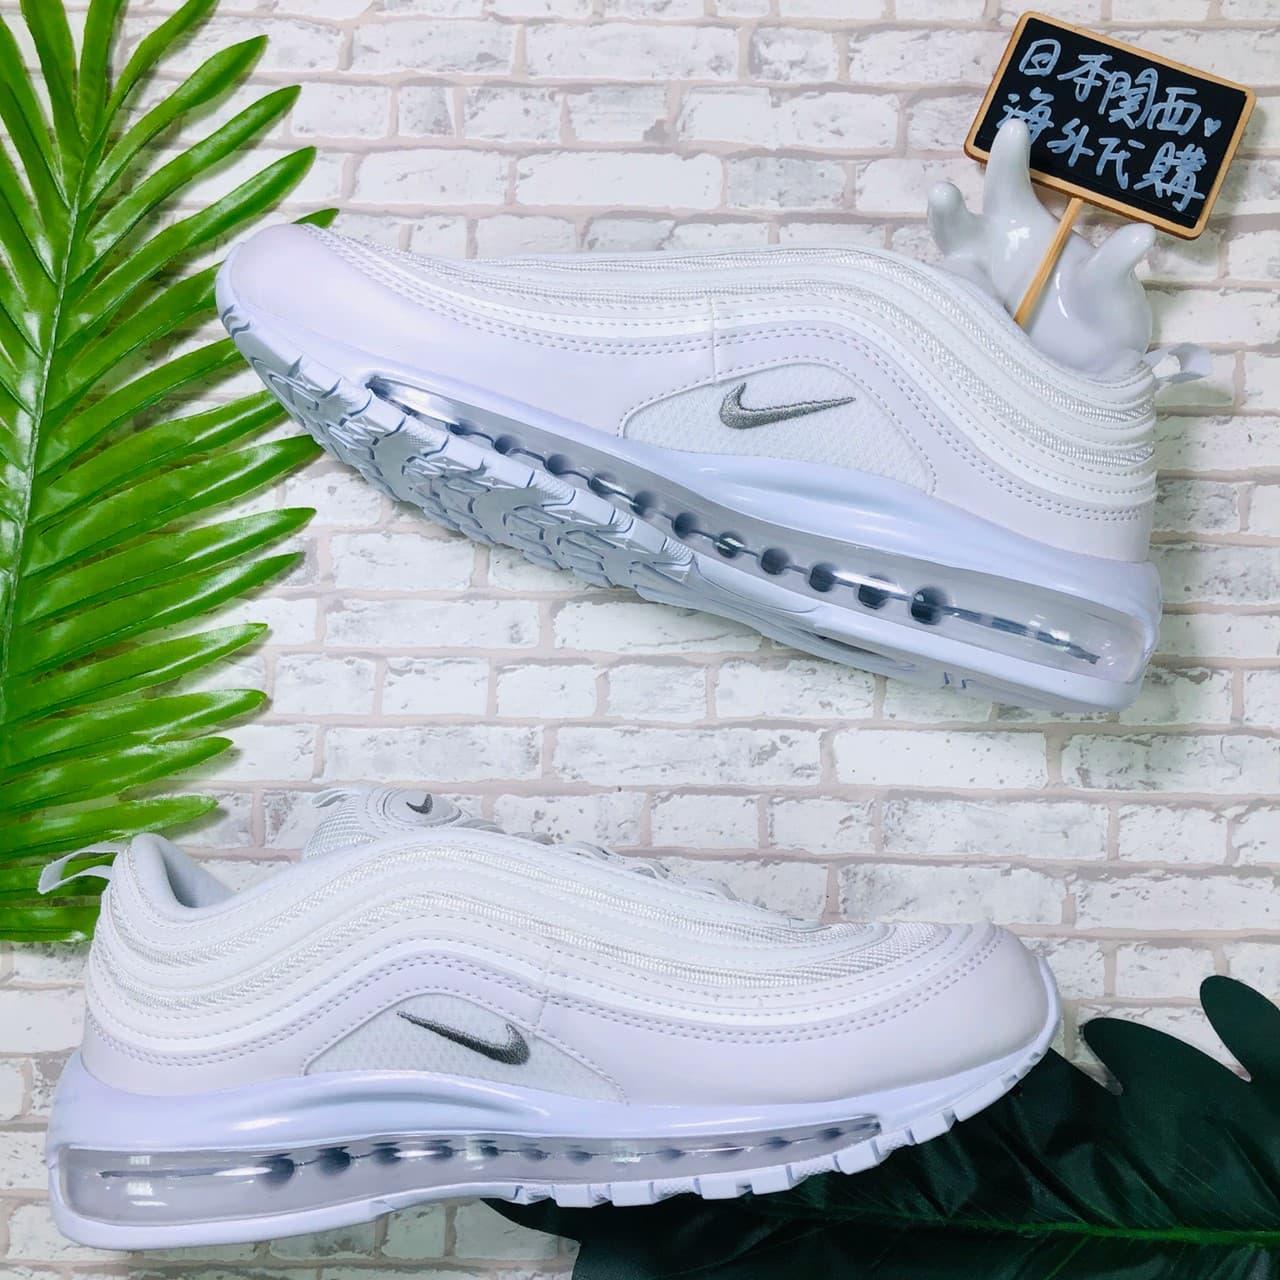 Nike Air Max 97 Triple White 白彈 全白 白 彈 氣墊 慢跑 男女 921826-101